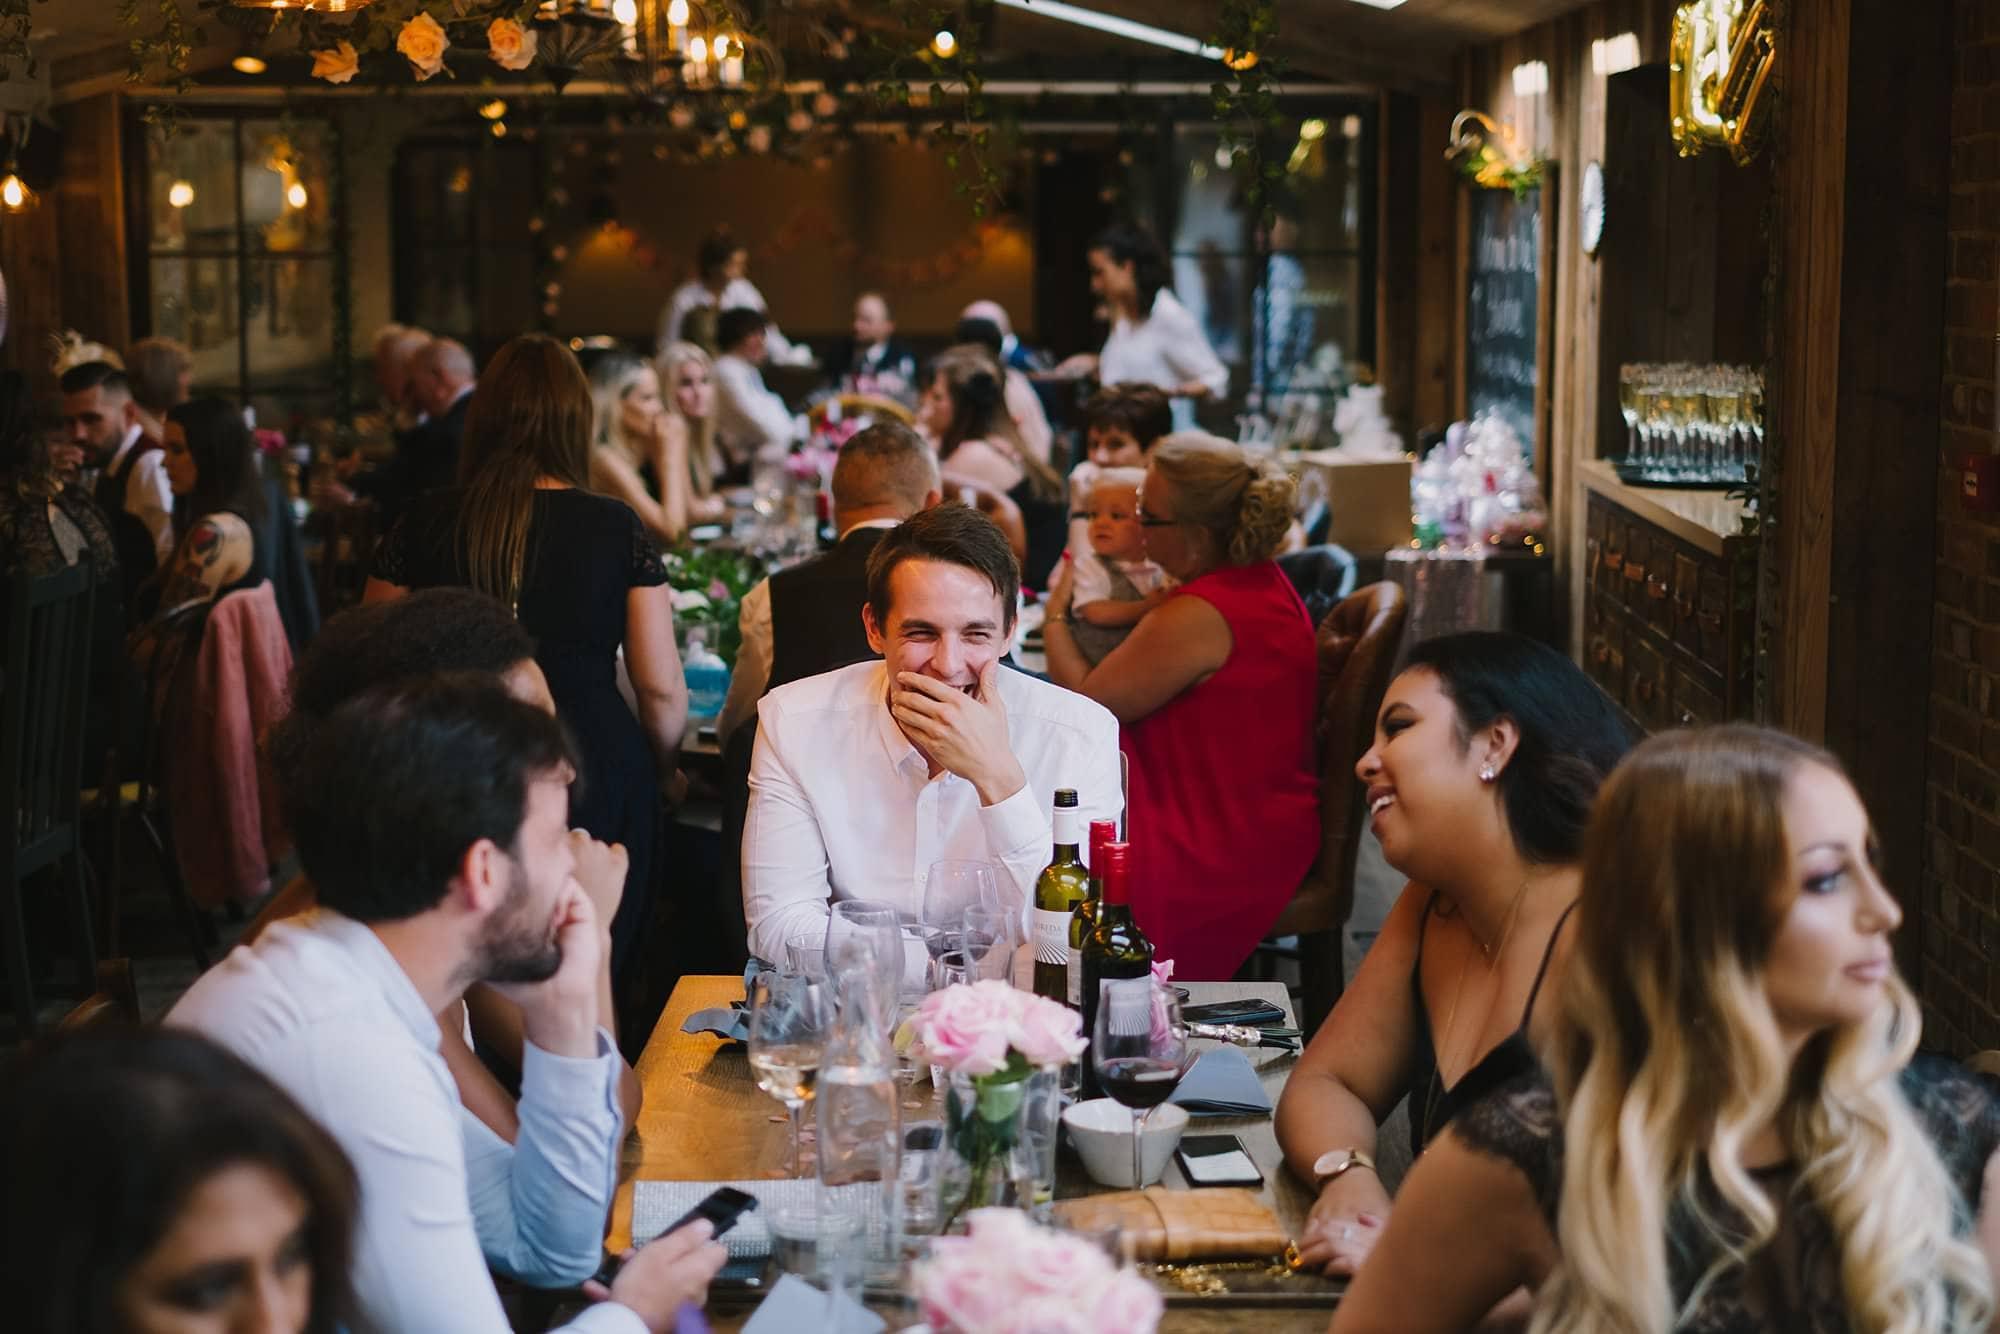 london pub wedding photographer jn 042 - The County Arms Wedding Photographer   Jen & Nick